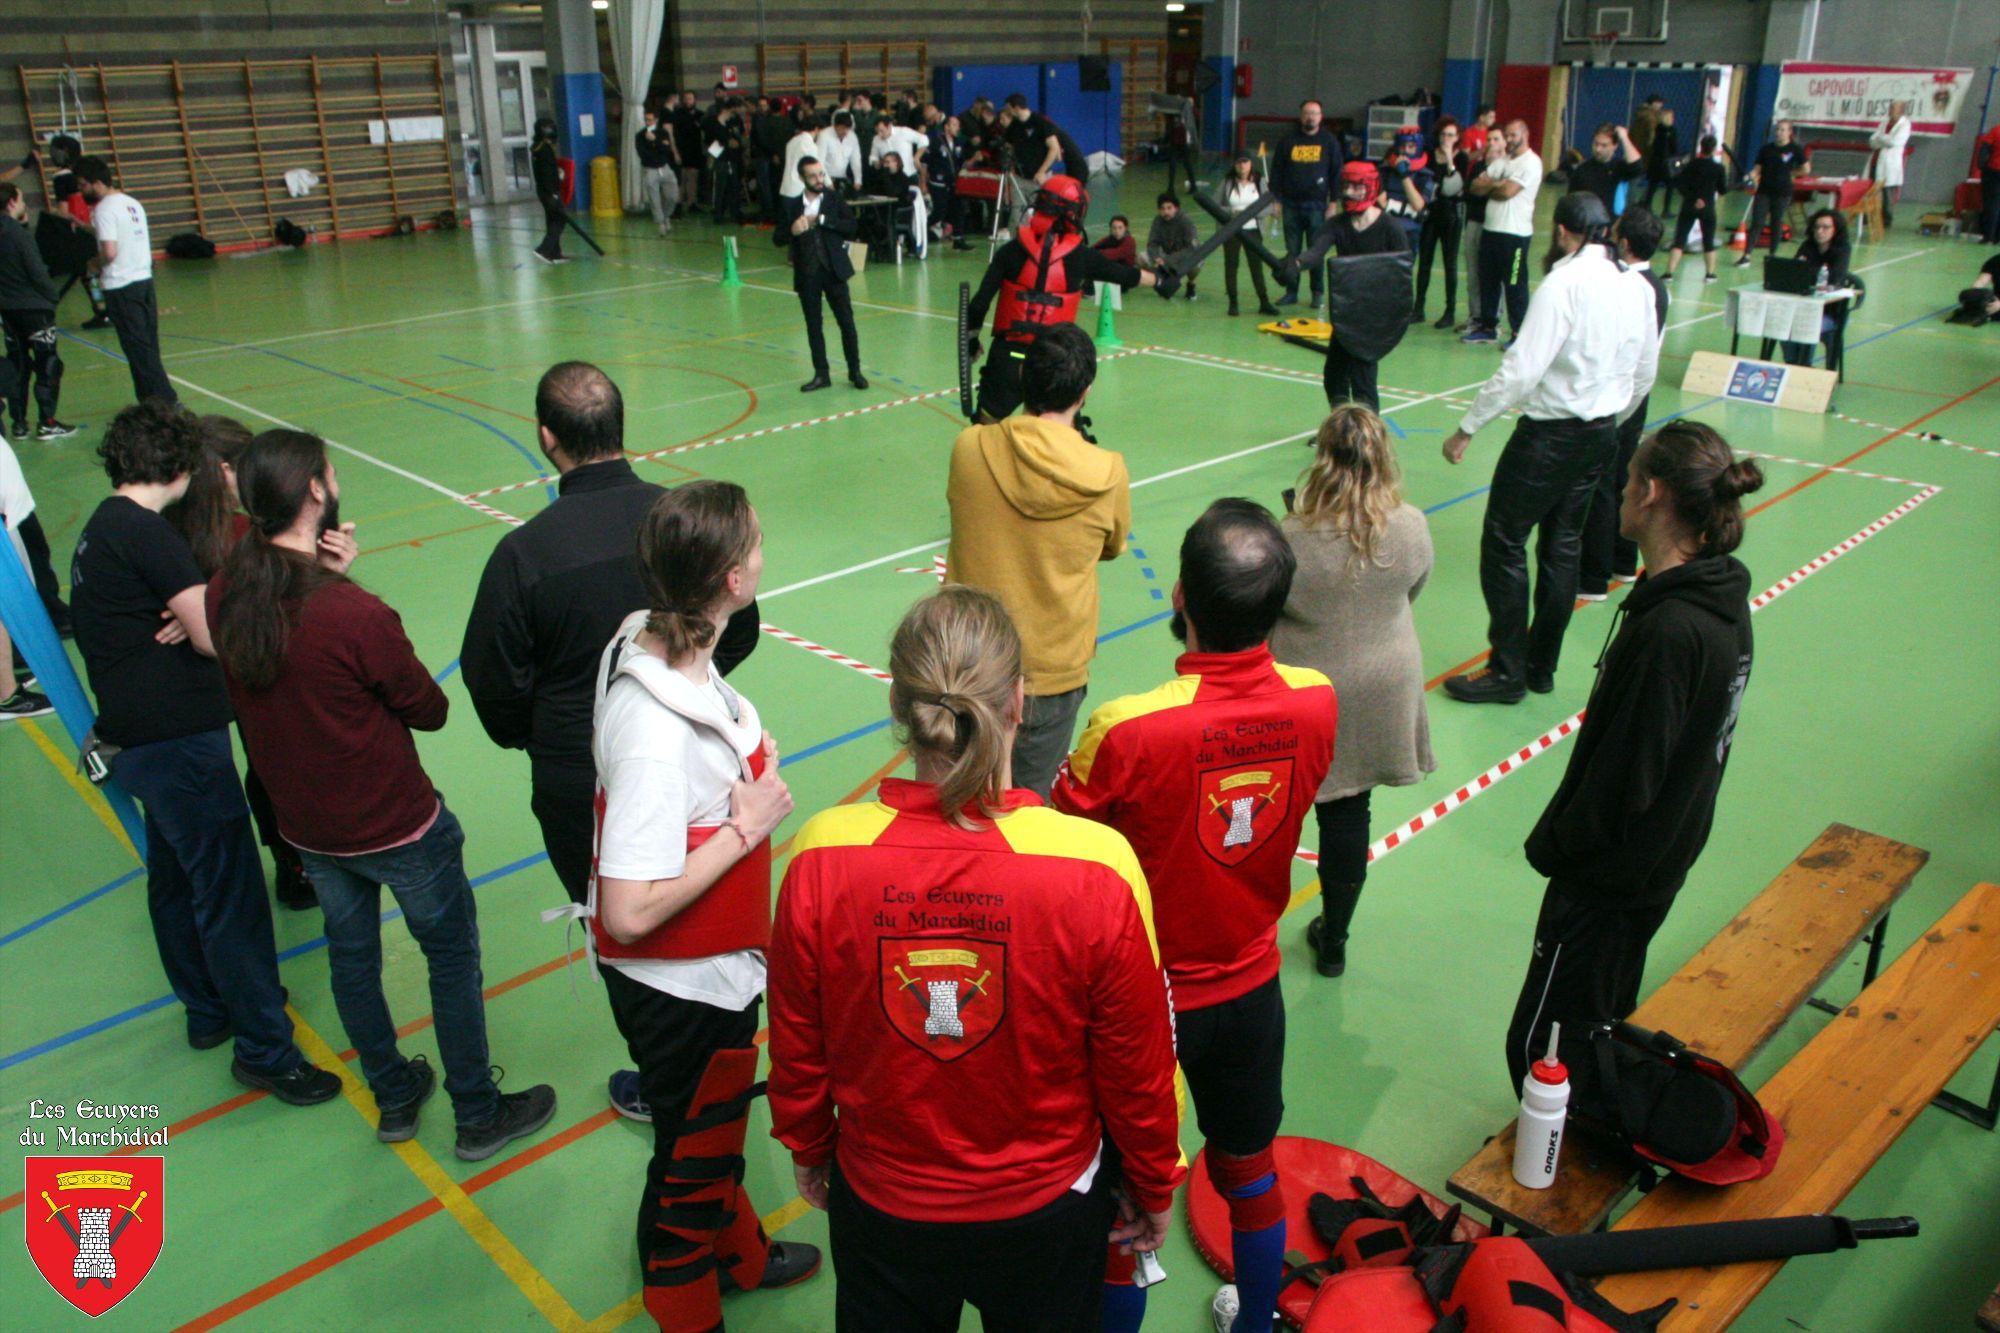 2017-11-17-Tournoi-MSF-Turin-04-marchidial.fr_